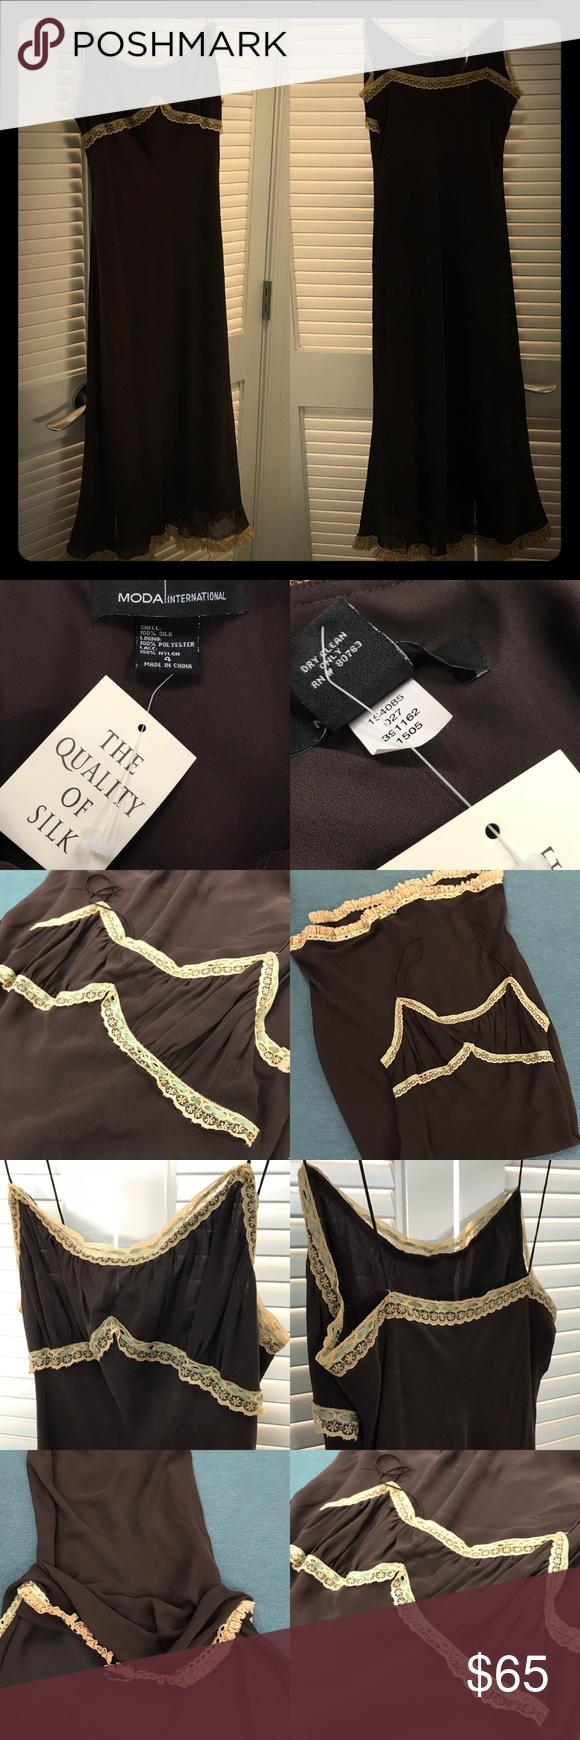 Vintage nwt moda international silk u lace dress nwt my posh